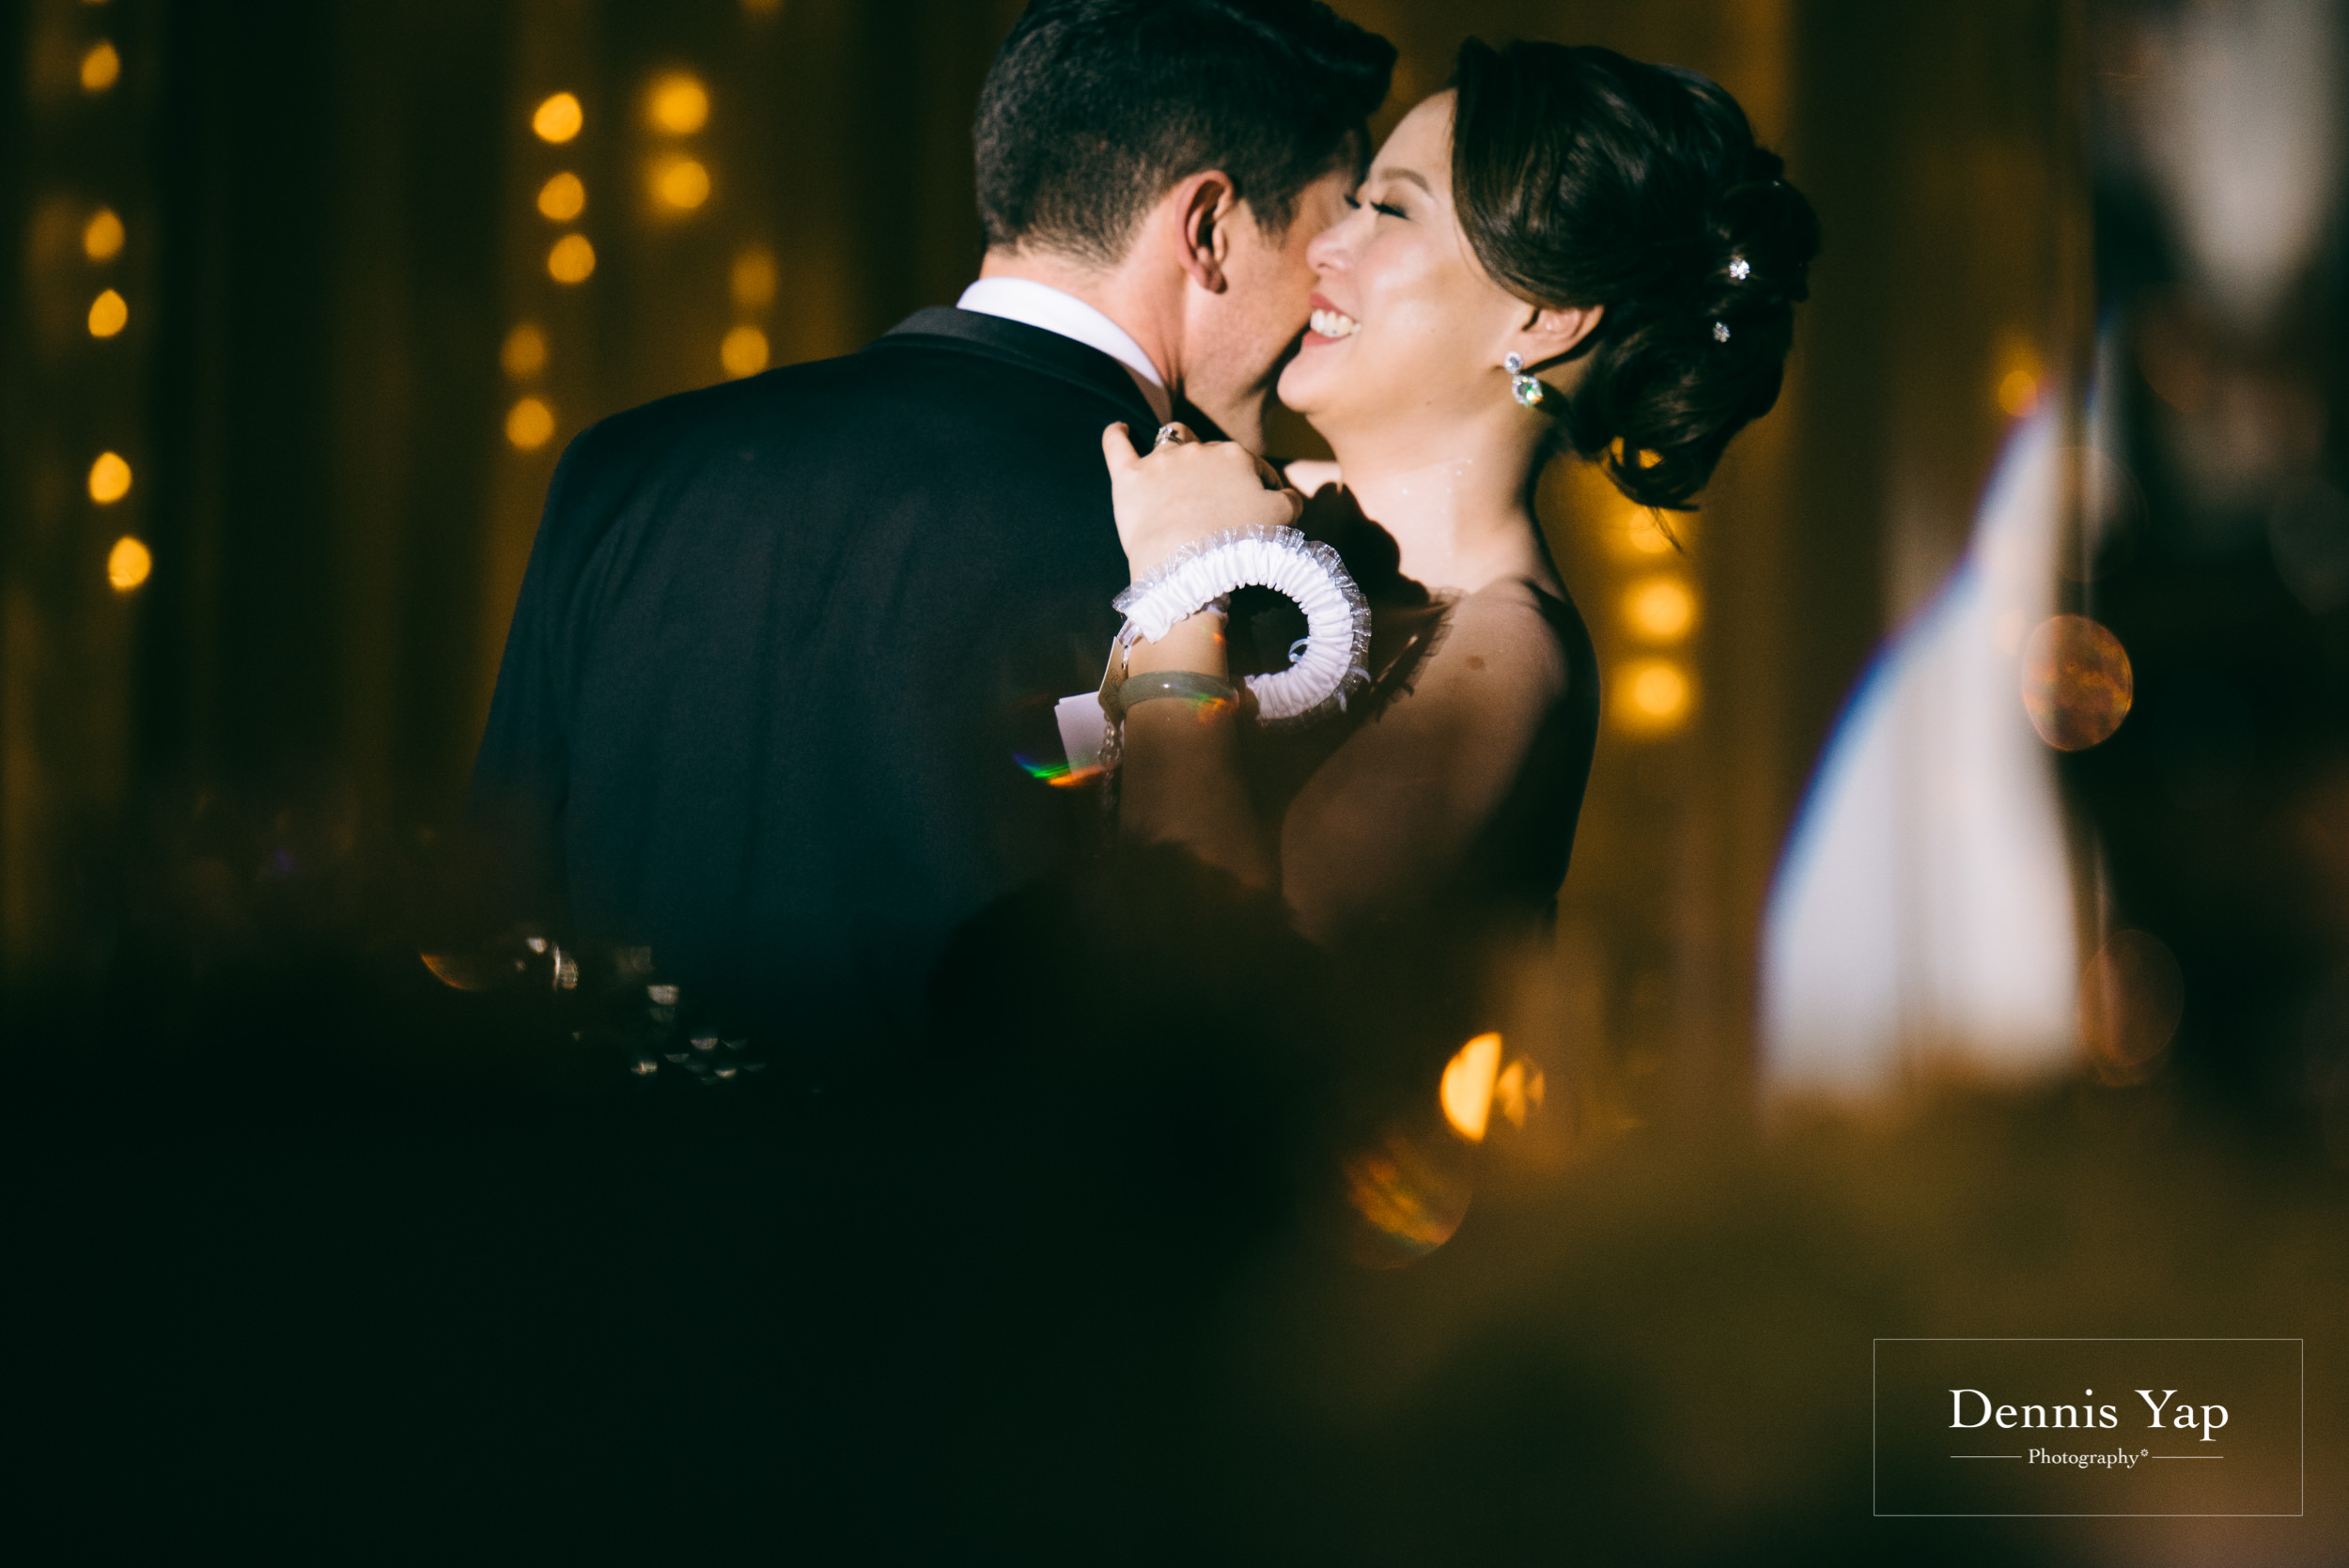 jordan amanda wedding day westin hotel kuala lumpur choe family dennis yap photography-32.jpg